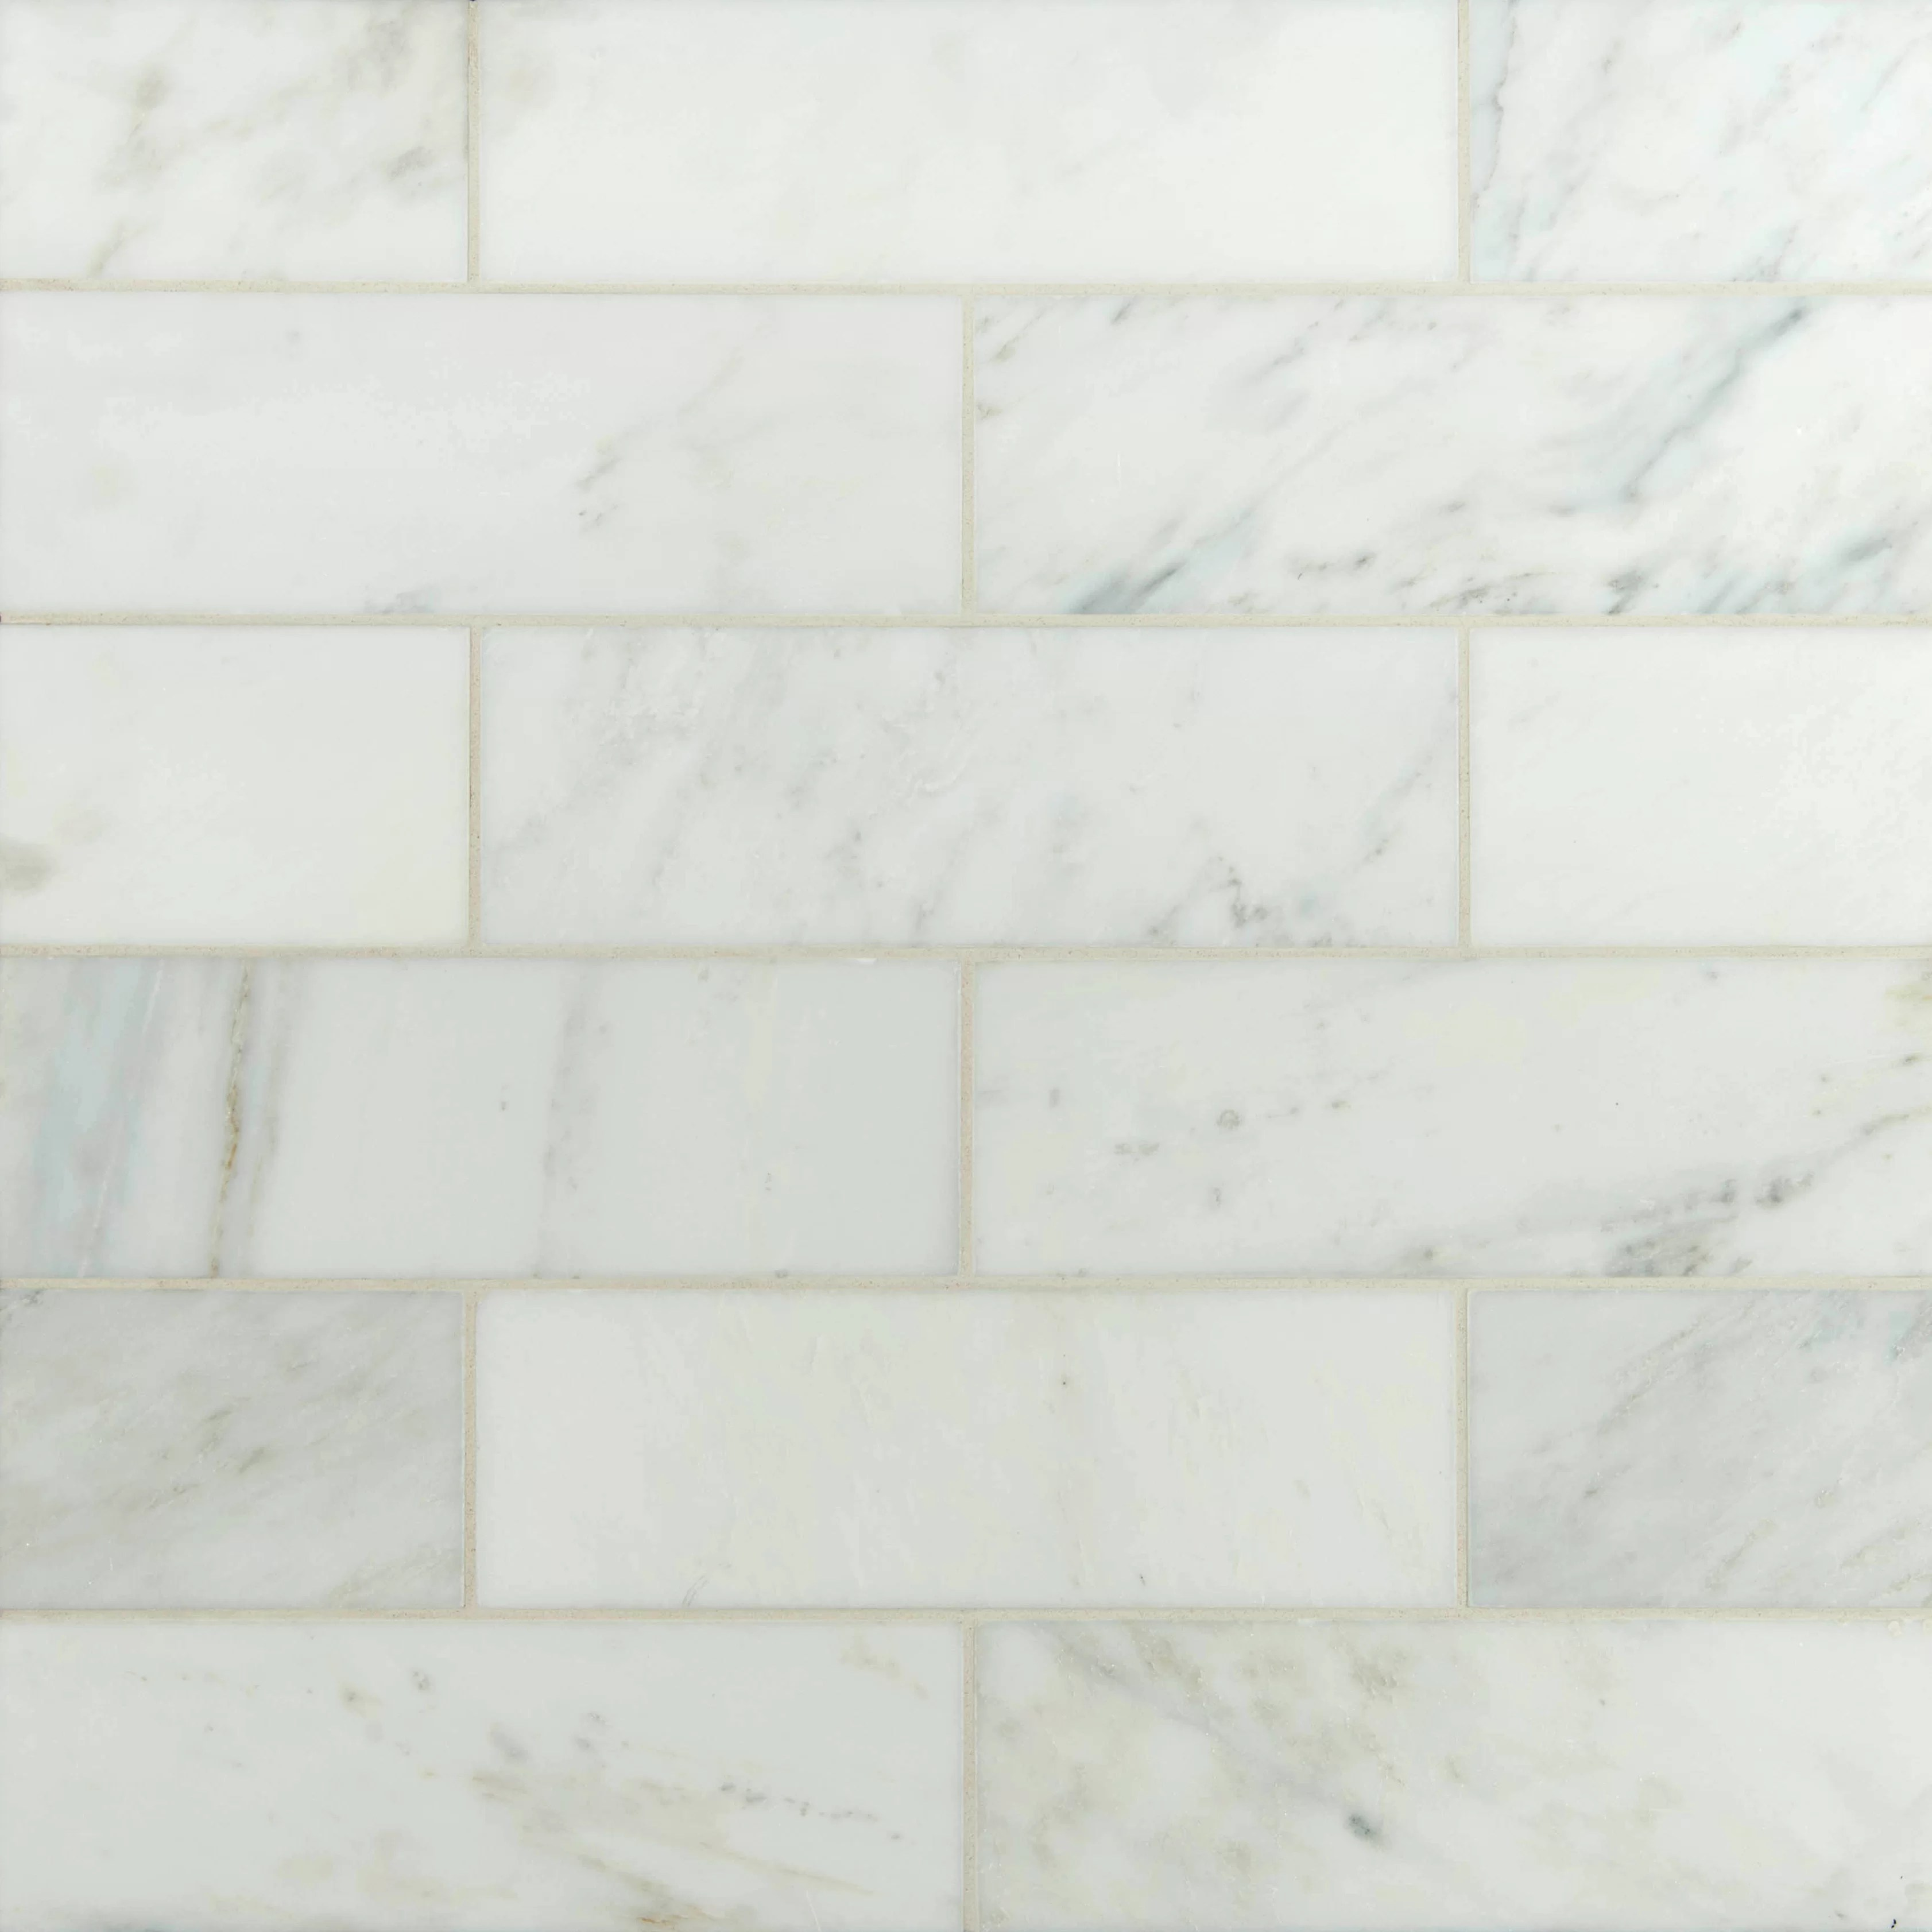 MSI 3 x 6 Polished Marble Tile in Carrara White